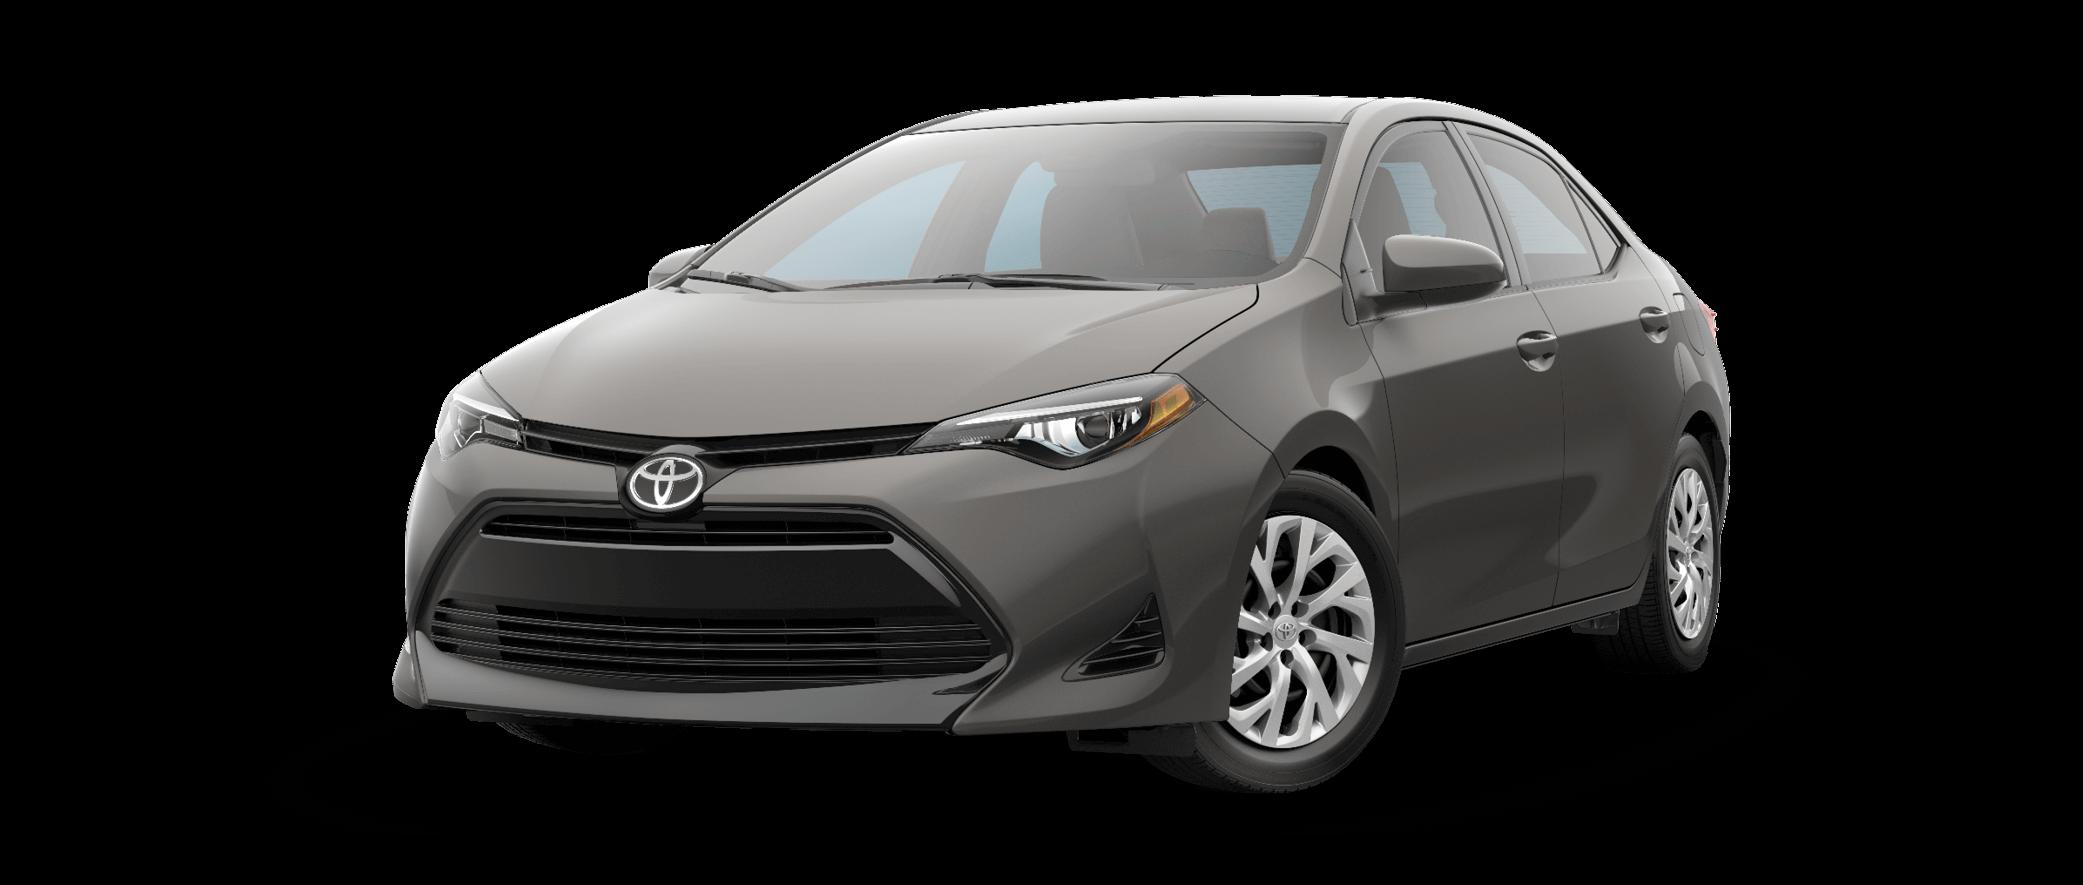 Ira Toyota Manchester Nh >> Toyota Cars | Berglund Toyota